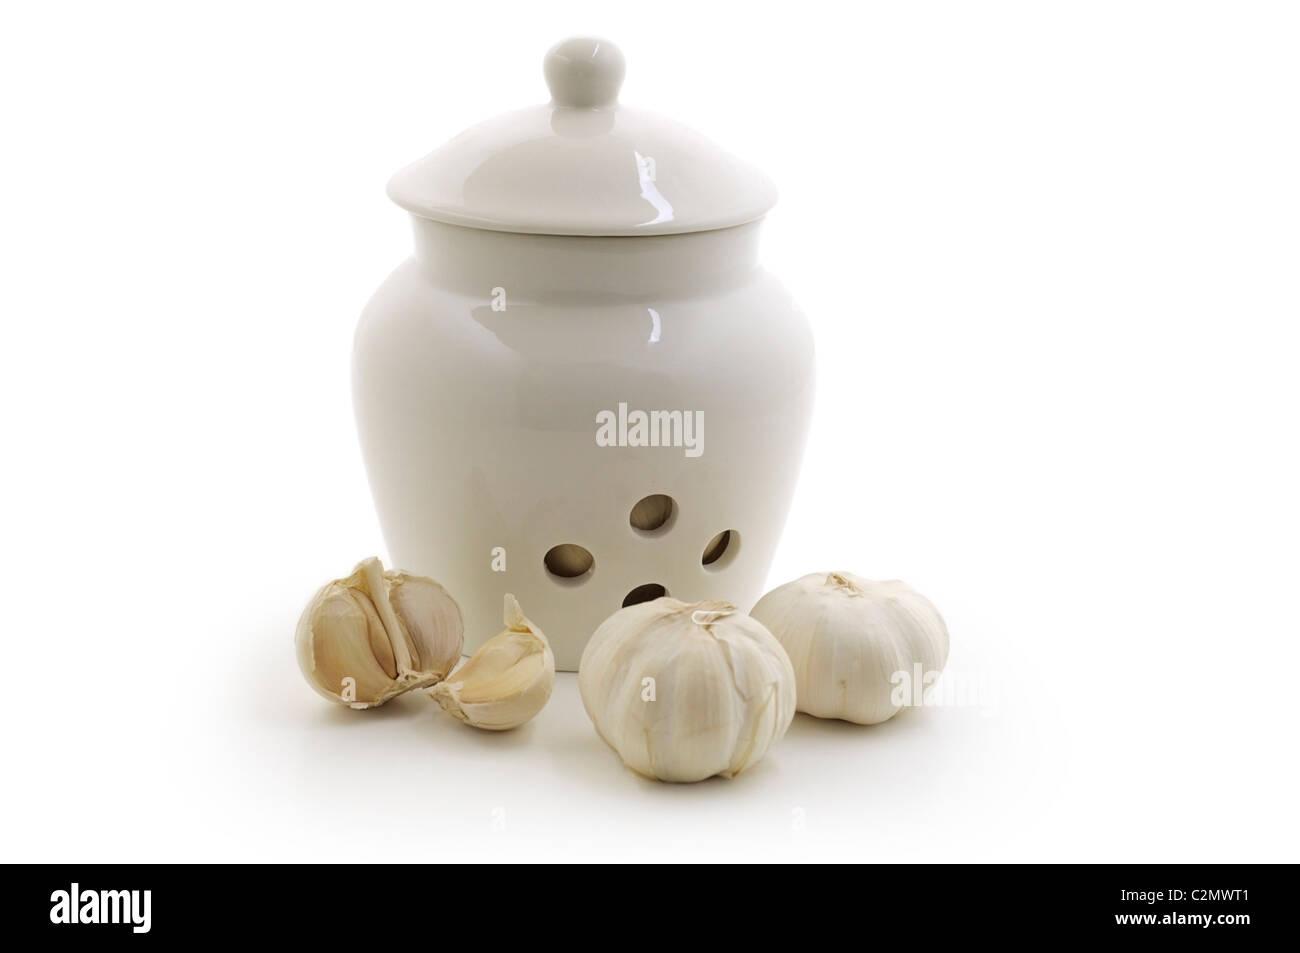 Garlic Cloves and Pot - Stock Image